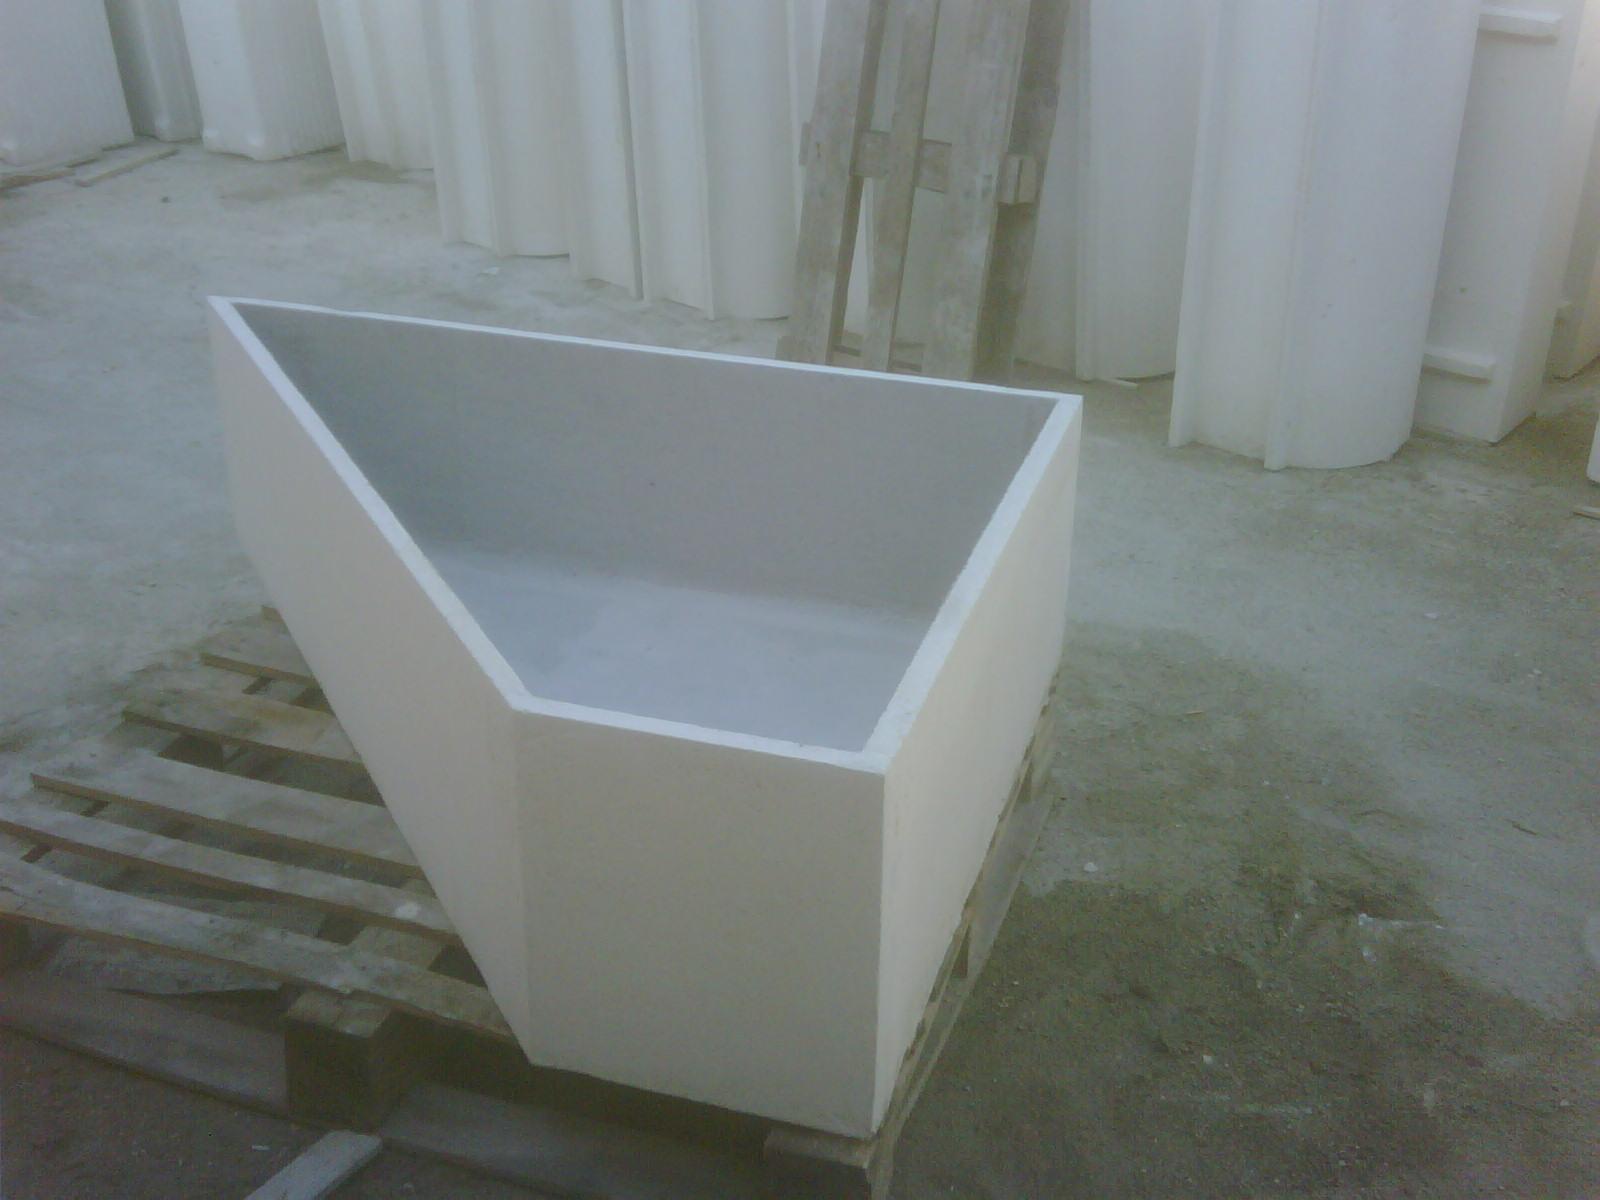 img00512-20110708-0820